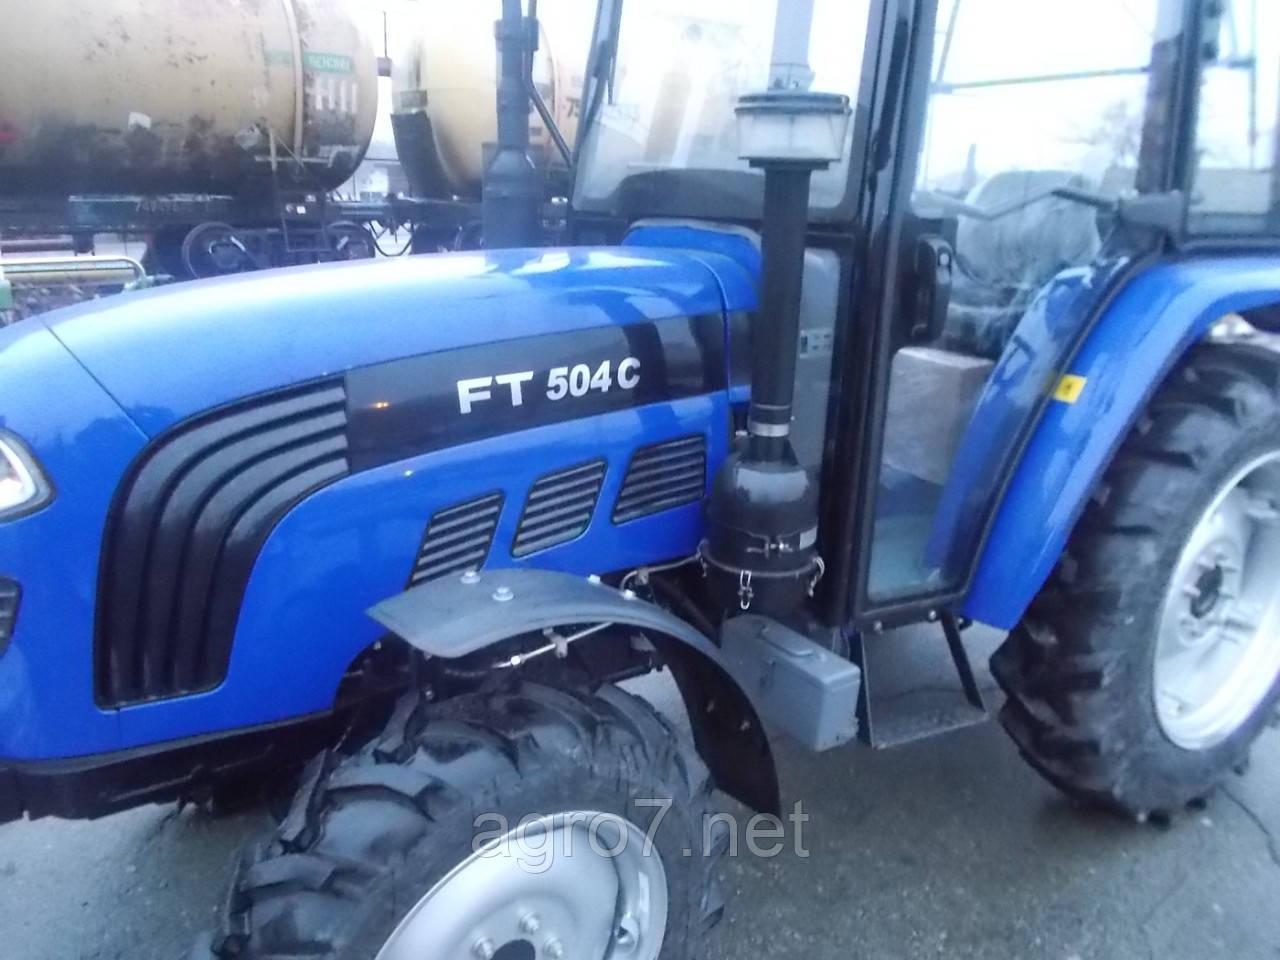 Трактор Foton FT504C 50л.с., реверс, 4*4, кабина.